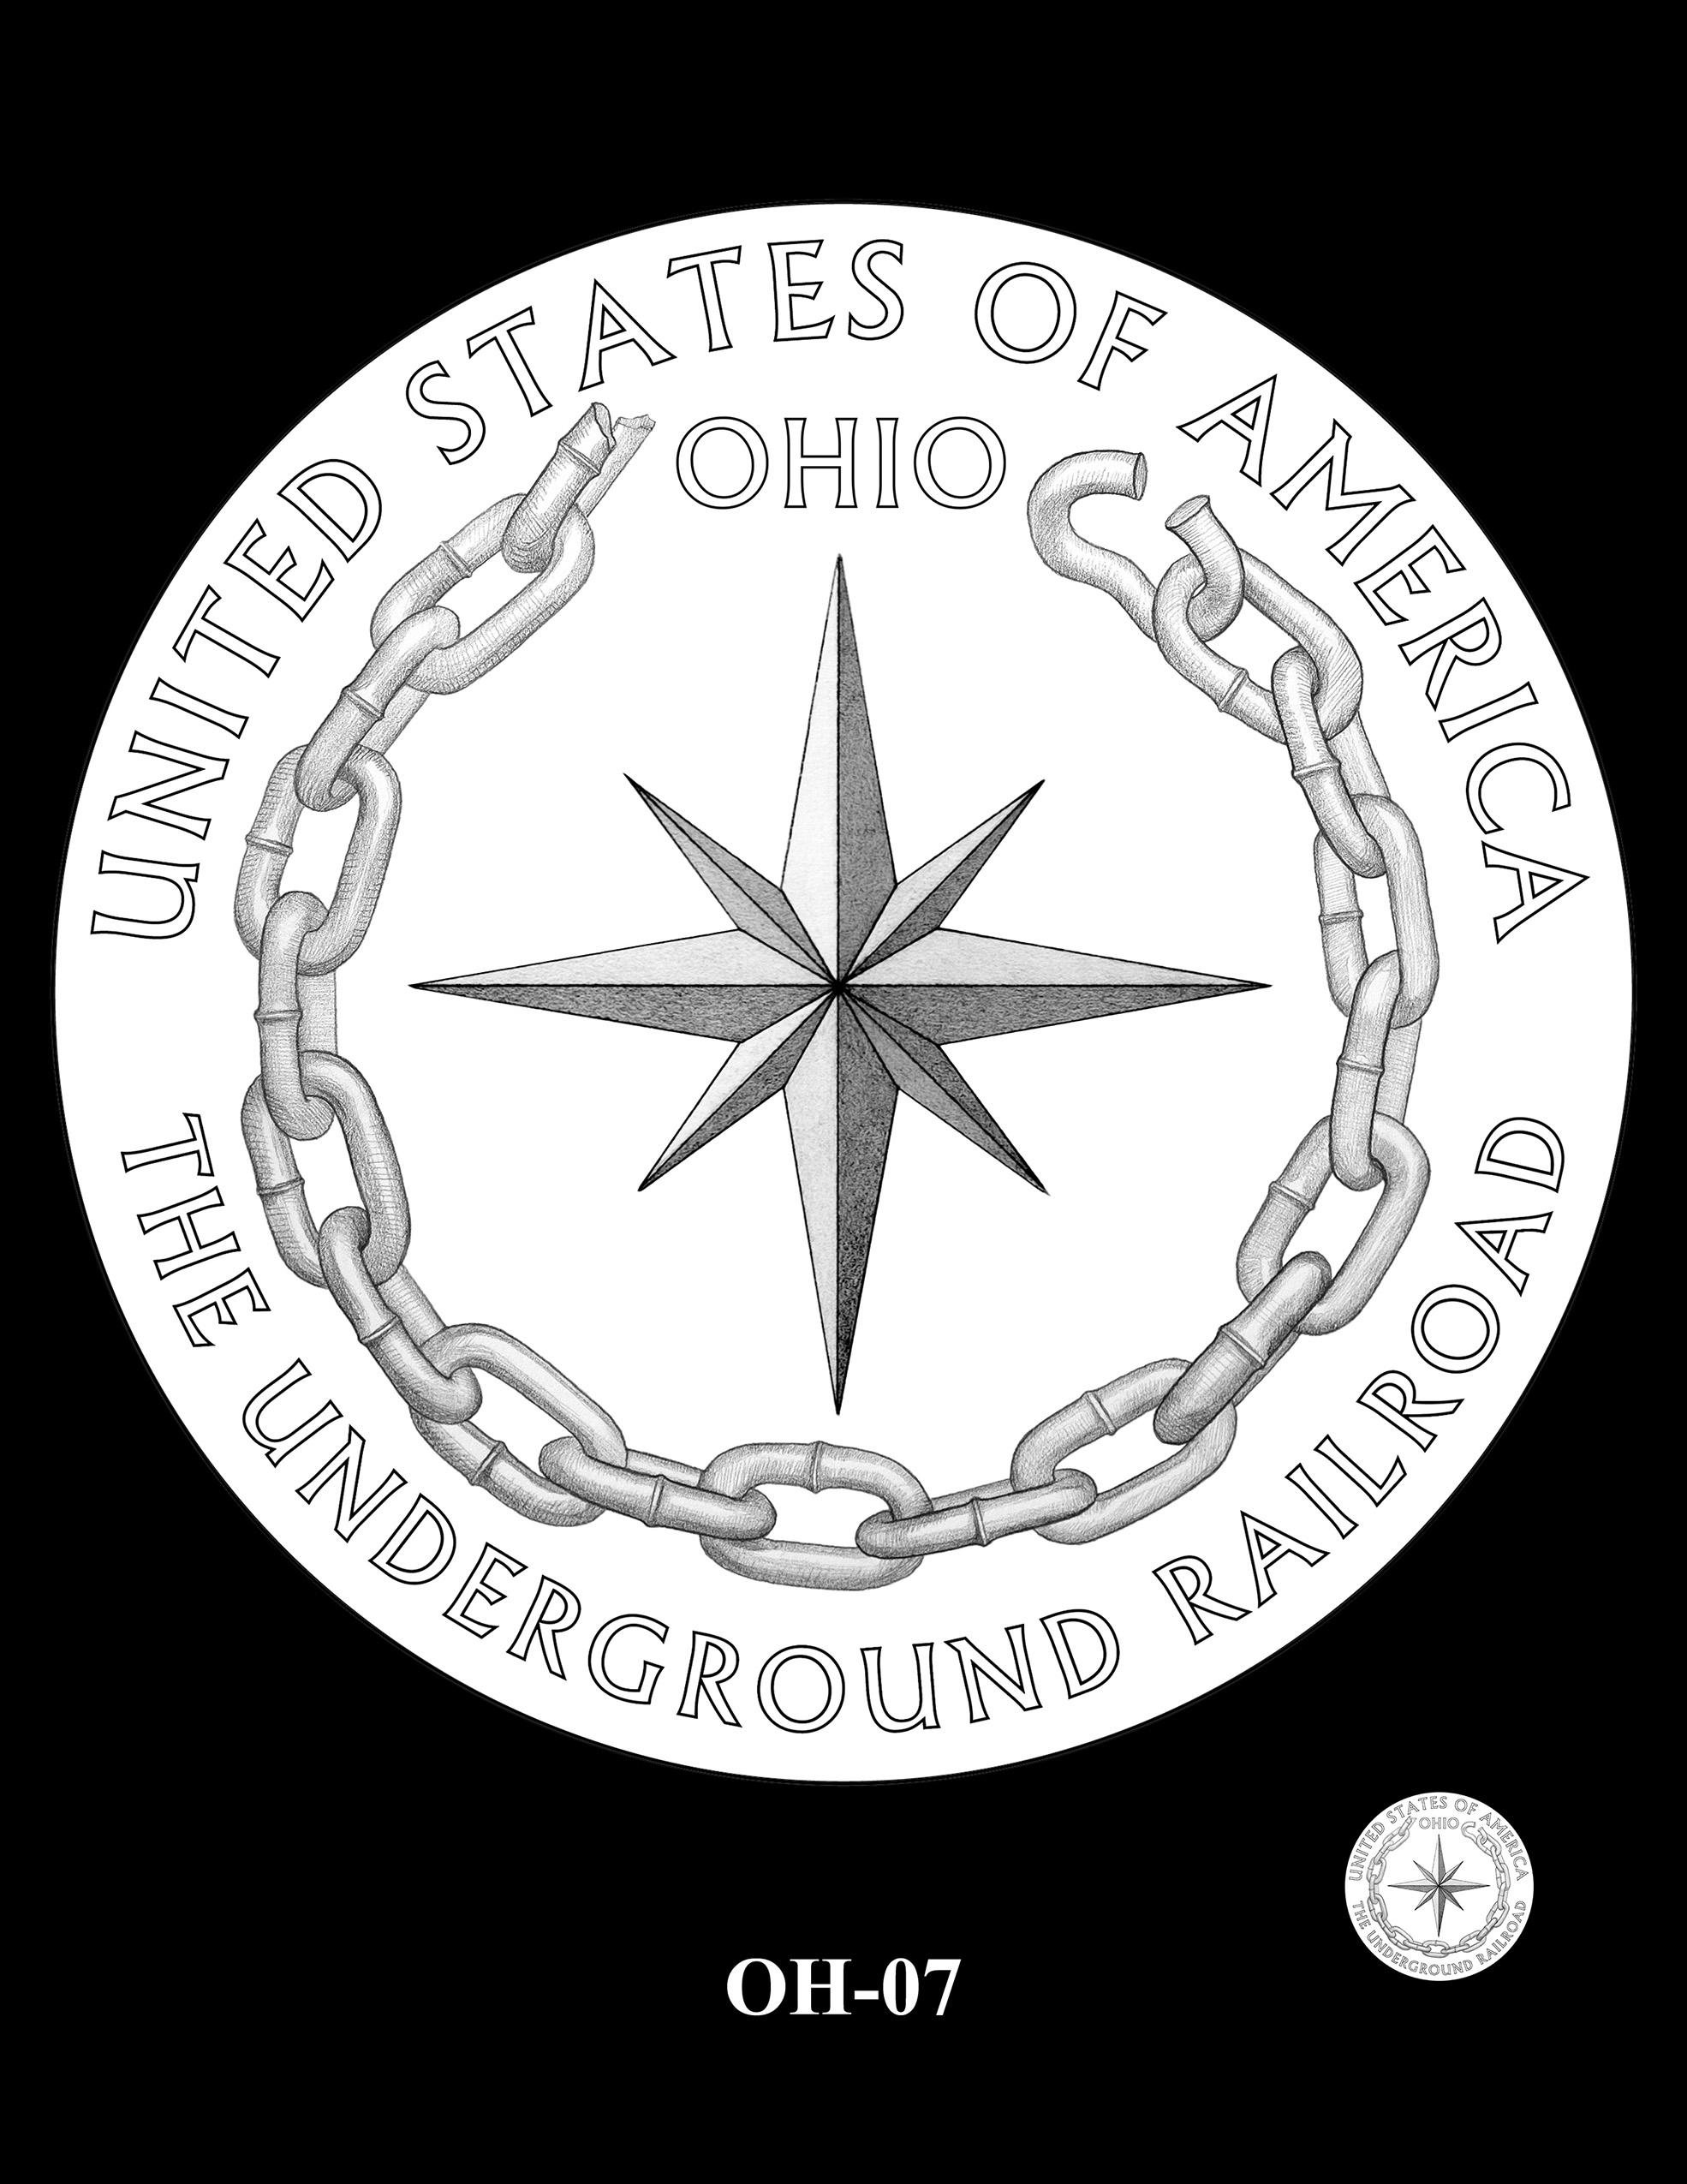 OH-07 -- 2023 American Innovation $1 Coin Program - Ohio